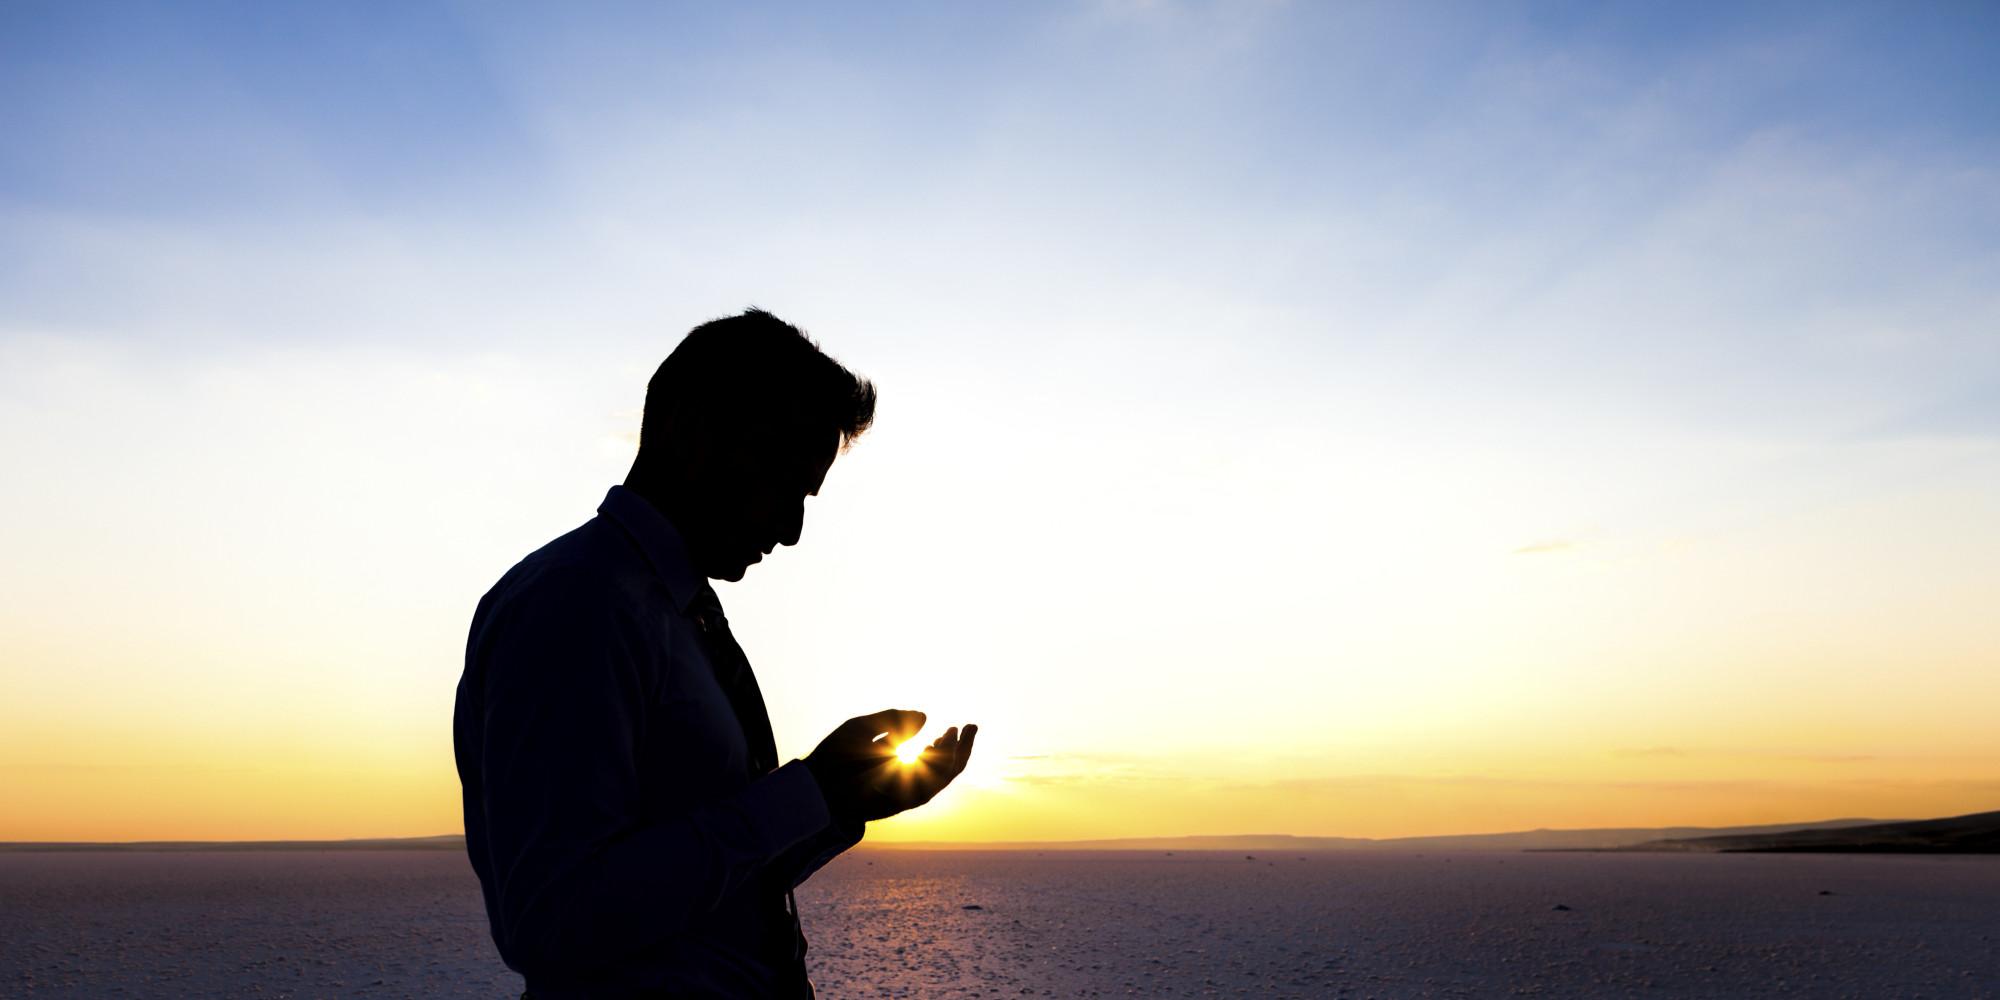 Terror Faith and Australian Identity A Young Muslim